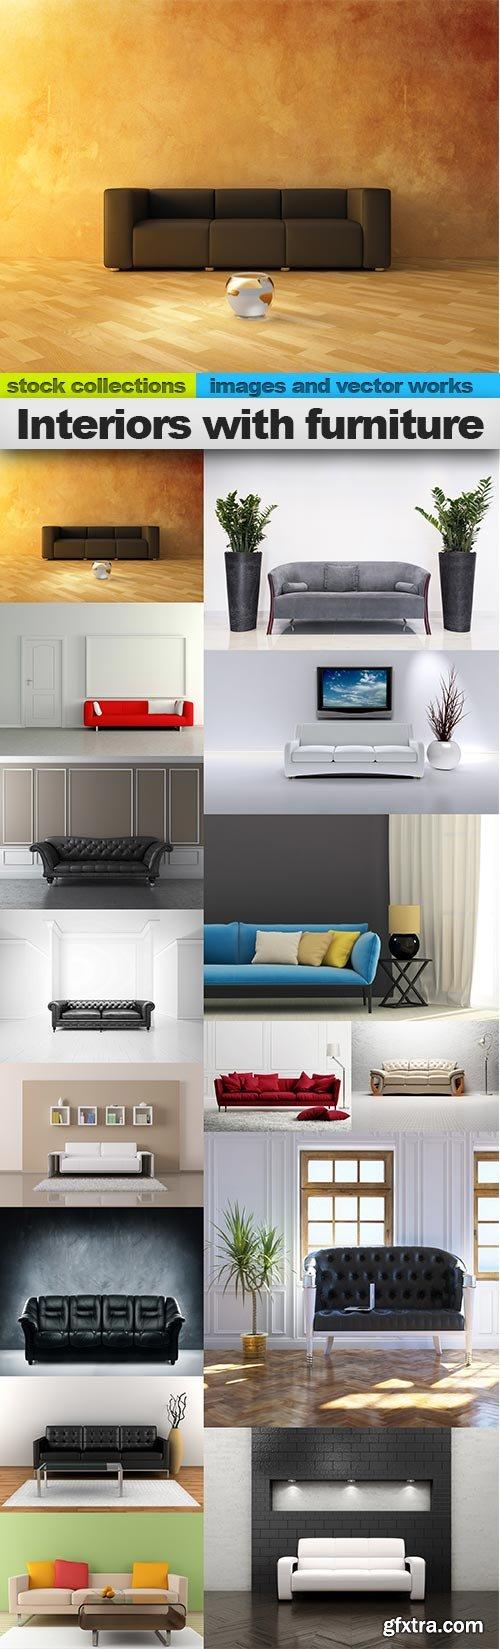 Interiors with furniture, 15 x UHQ JPEG